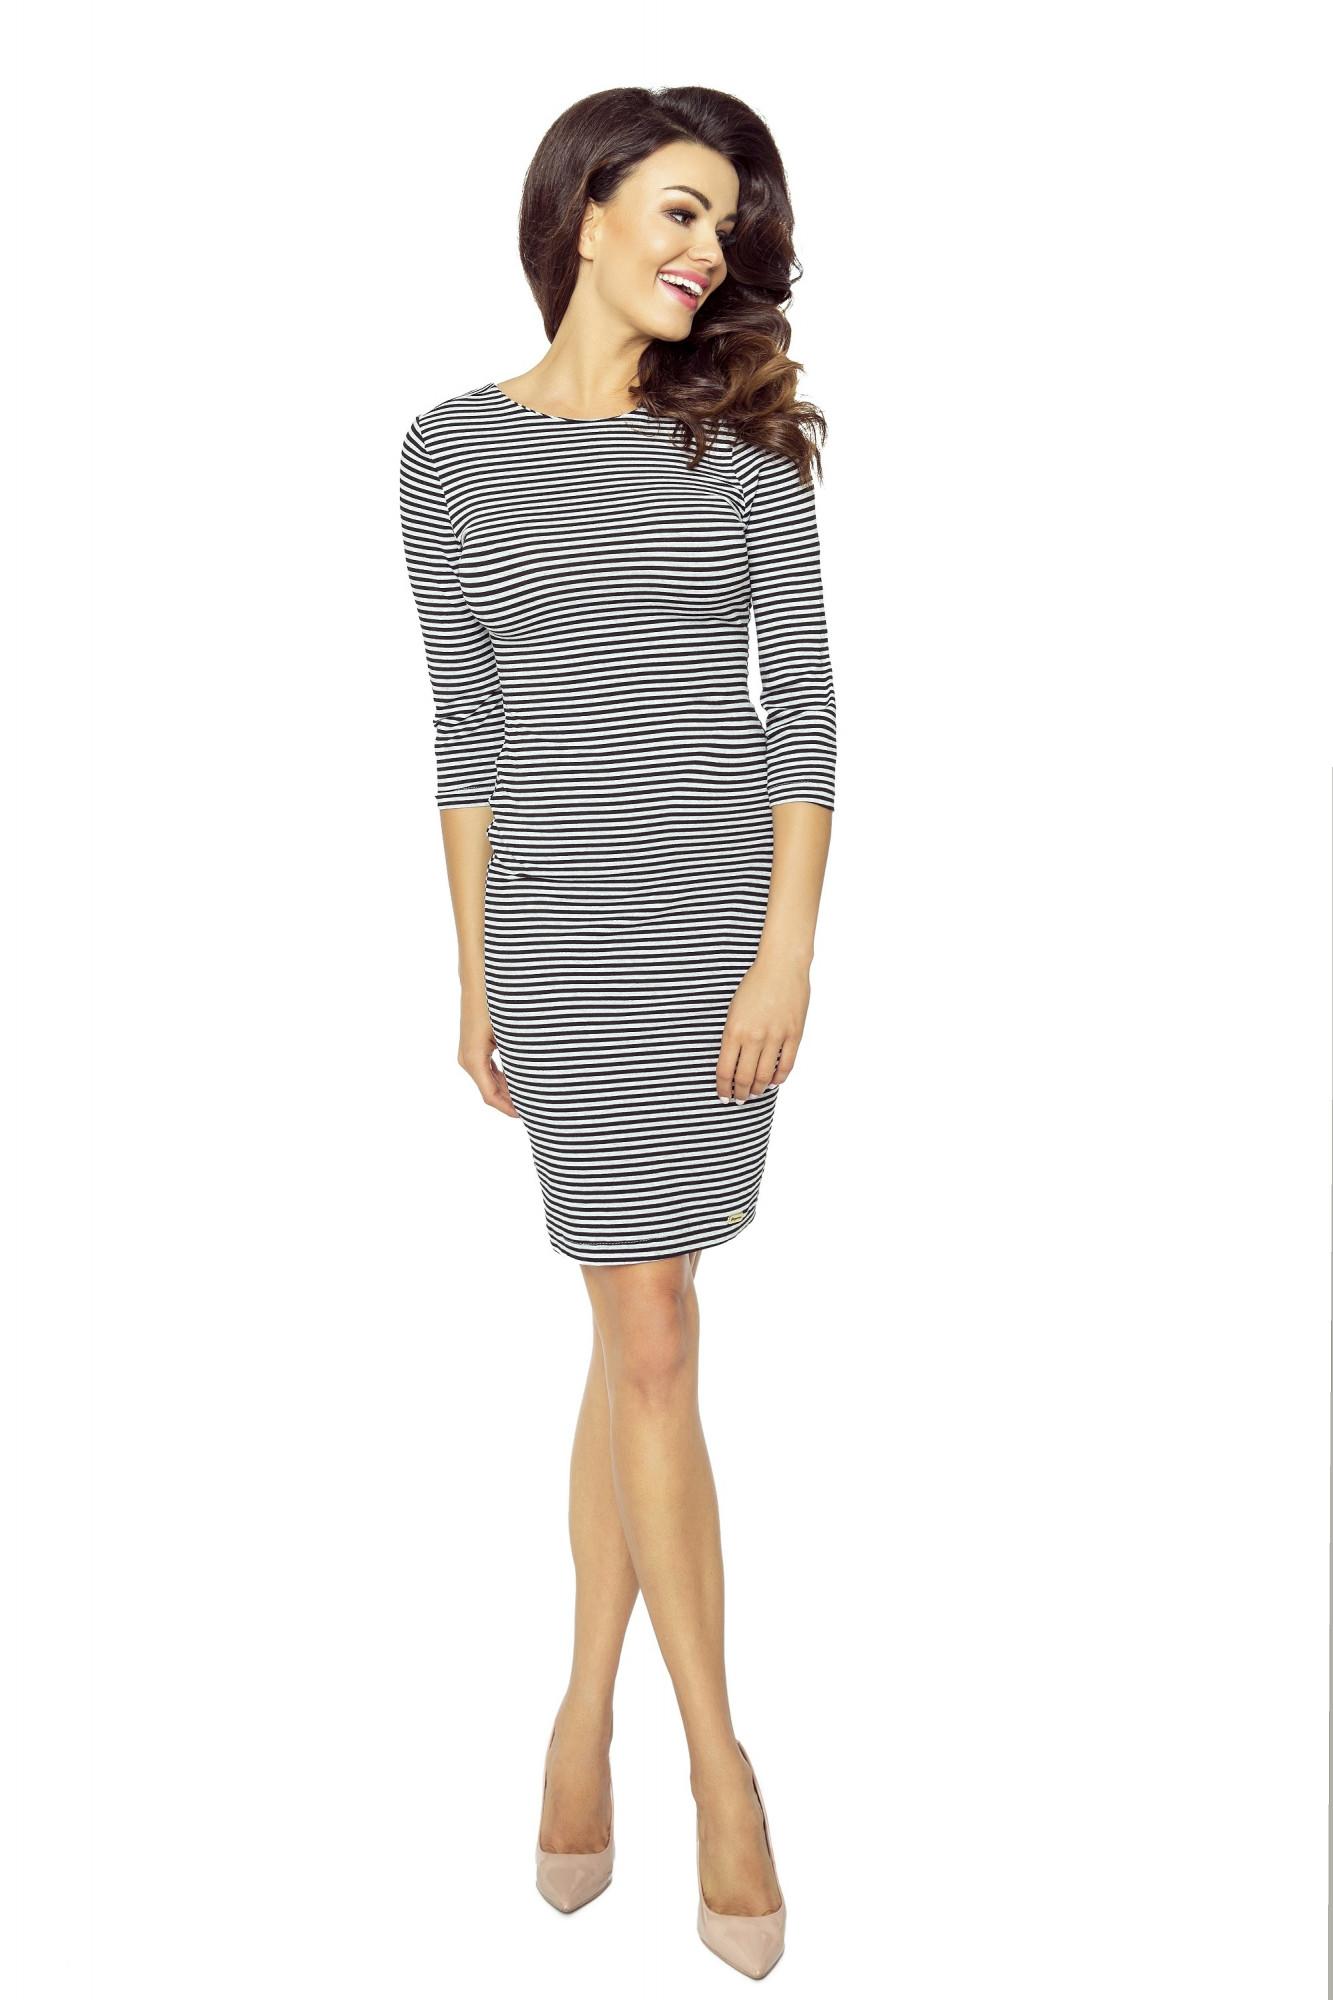 Dámské šaty M50627-CN03-1 - BERGAMO Barva: modro-bílá, Velikost: M